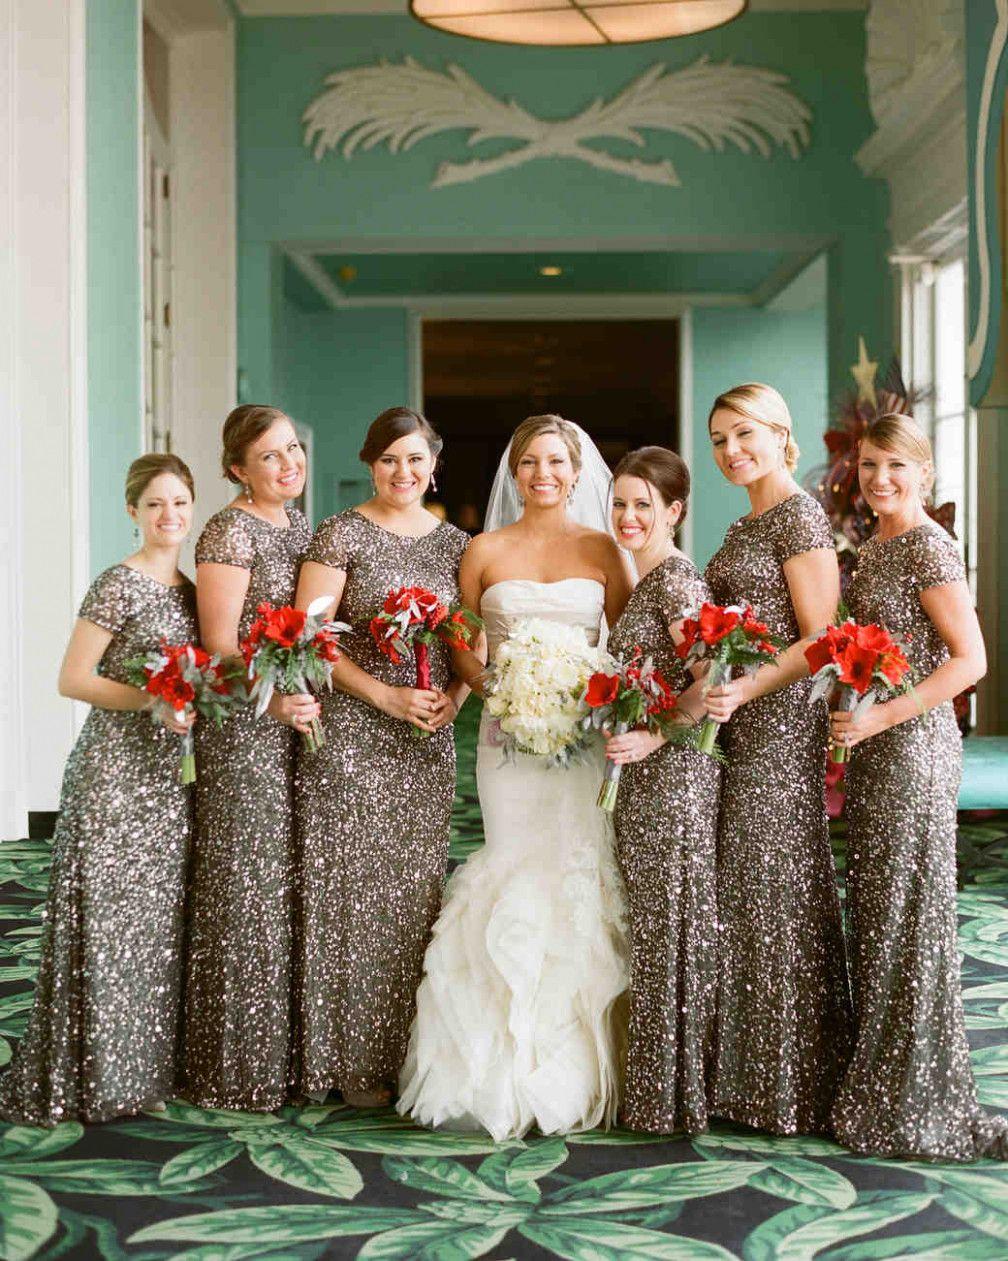 14 New Years Eve Wedding Ideas Martha Weddings Winterwedding Partynewyeve